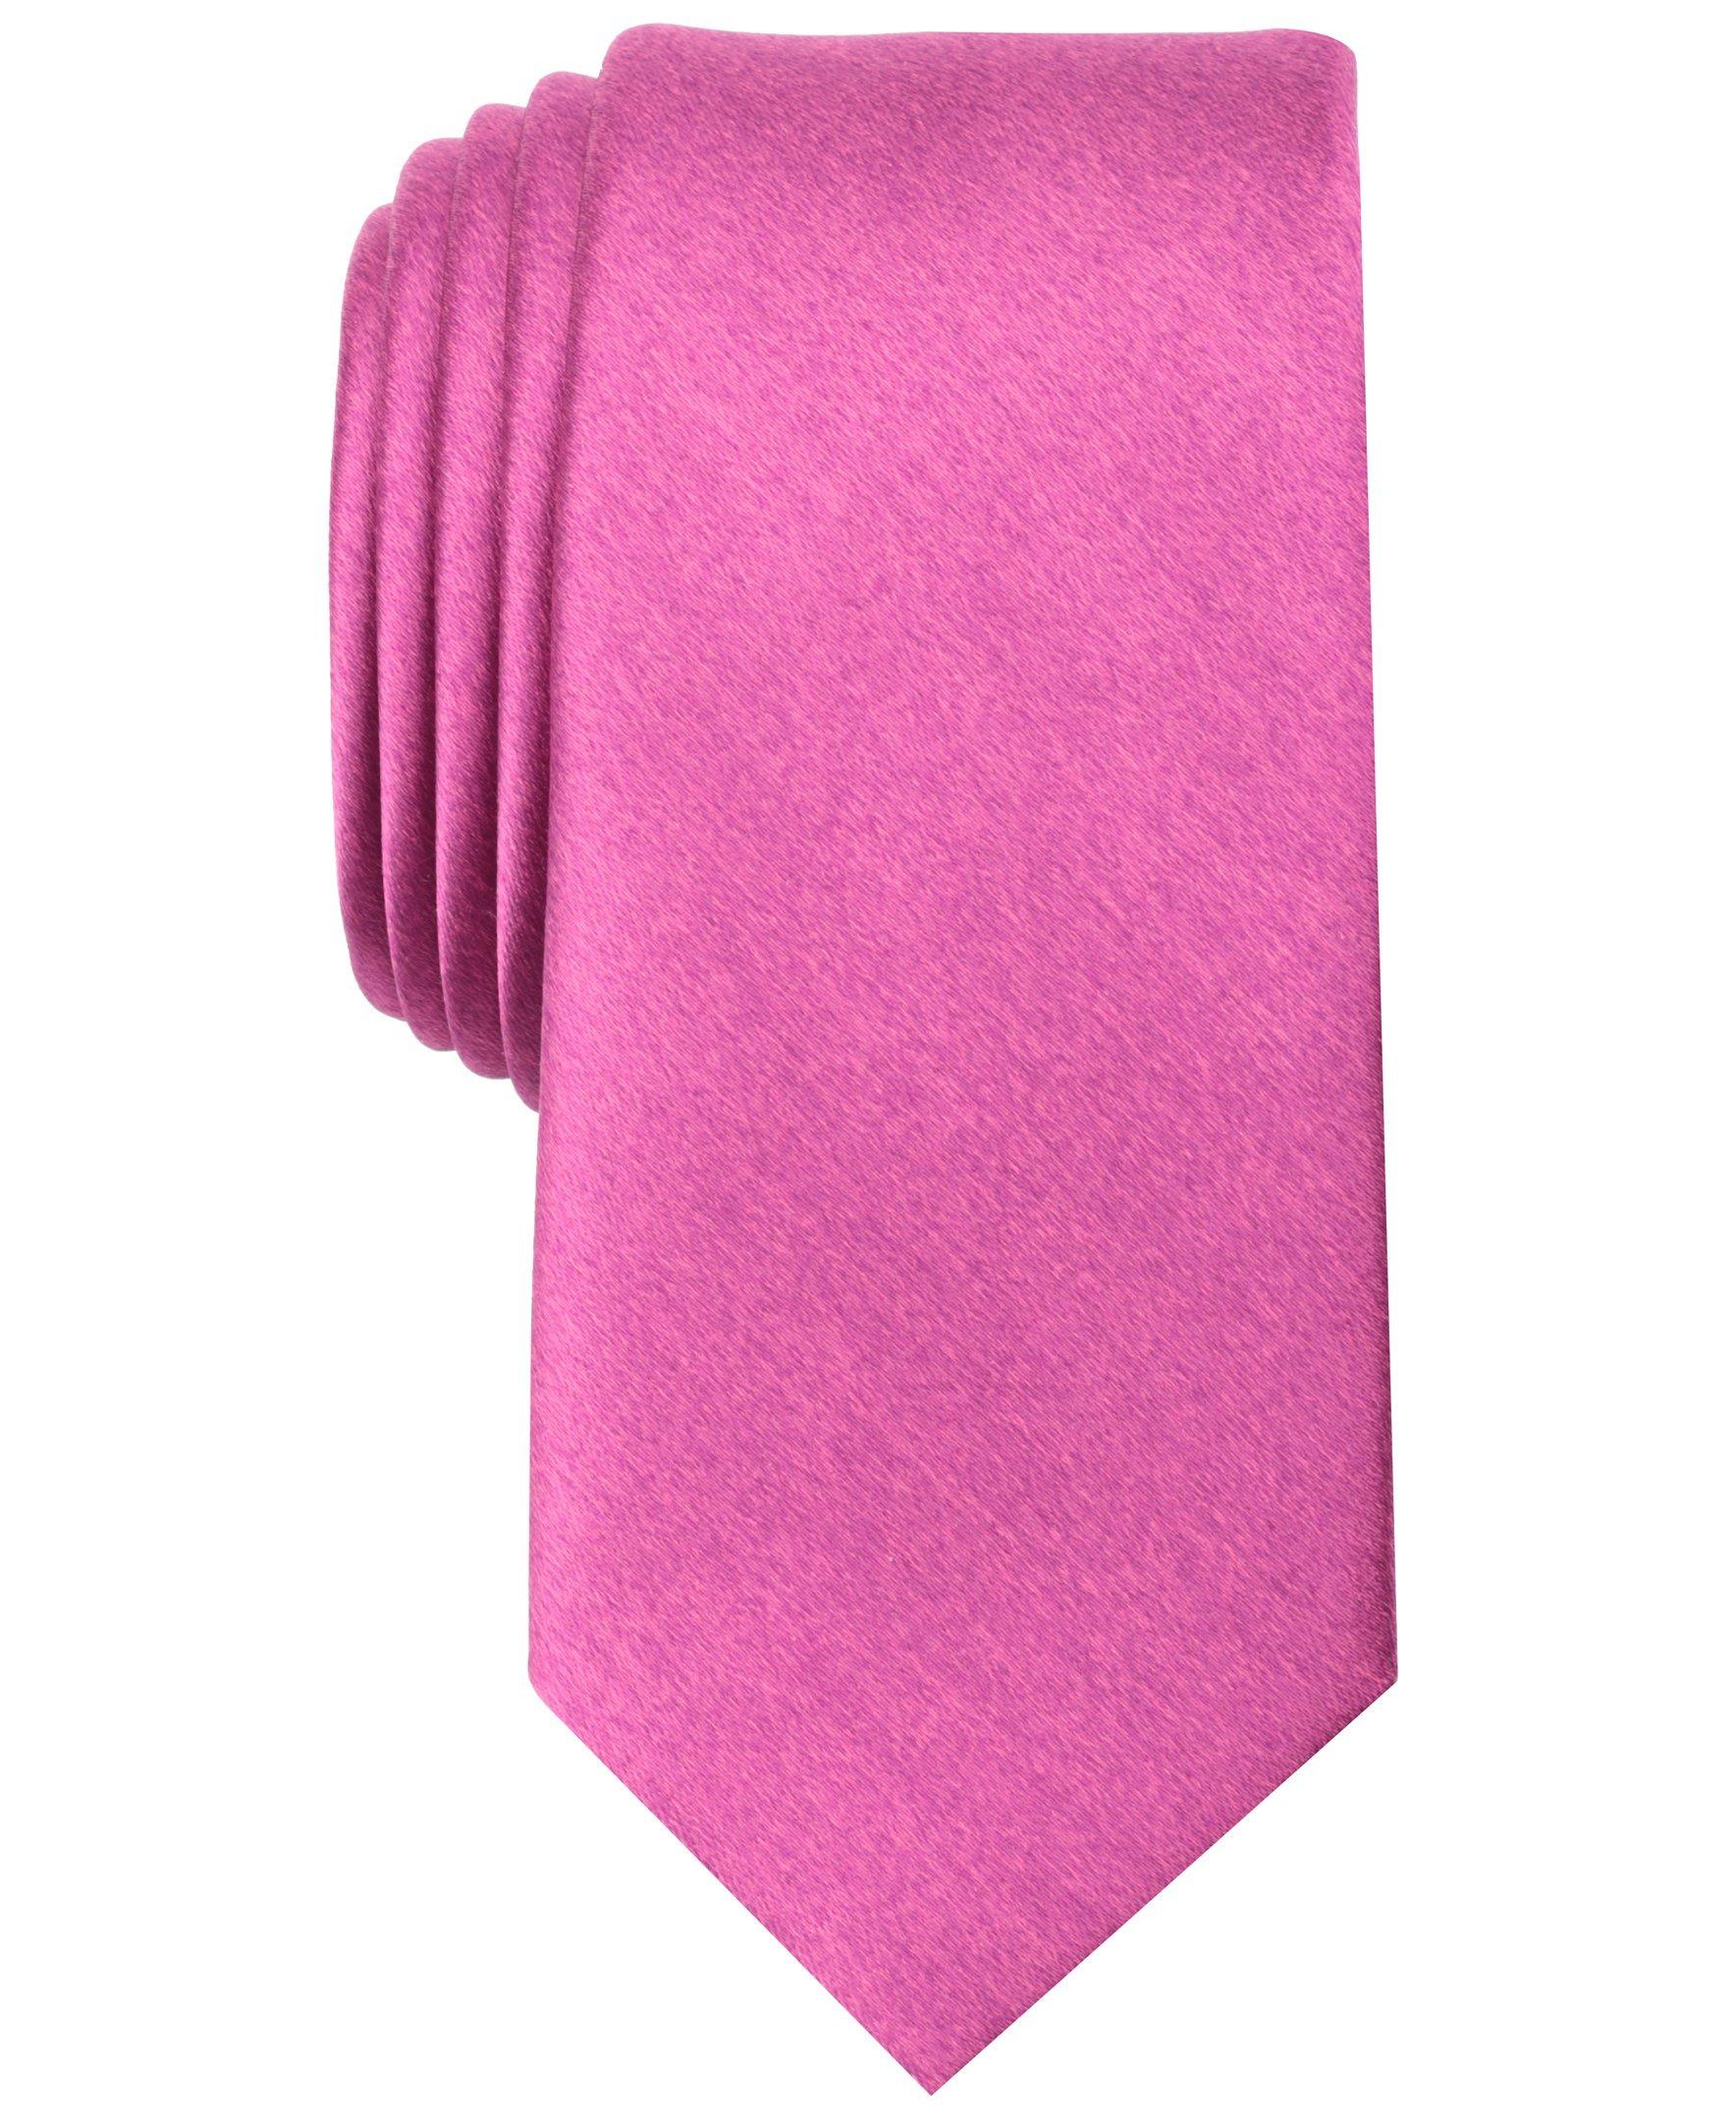 Original Penguin Men's Solid Satin Super Slim Tie, Pink, One Size